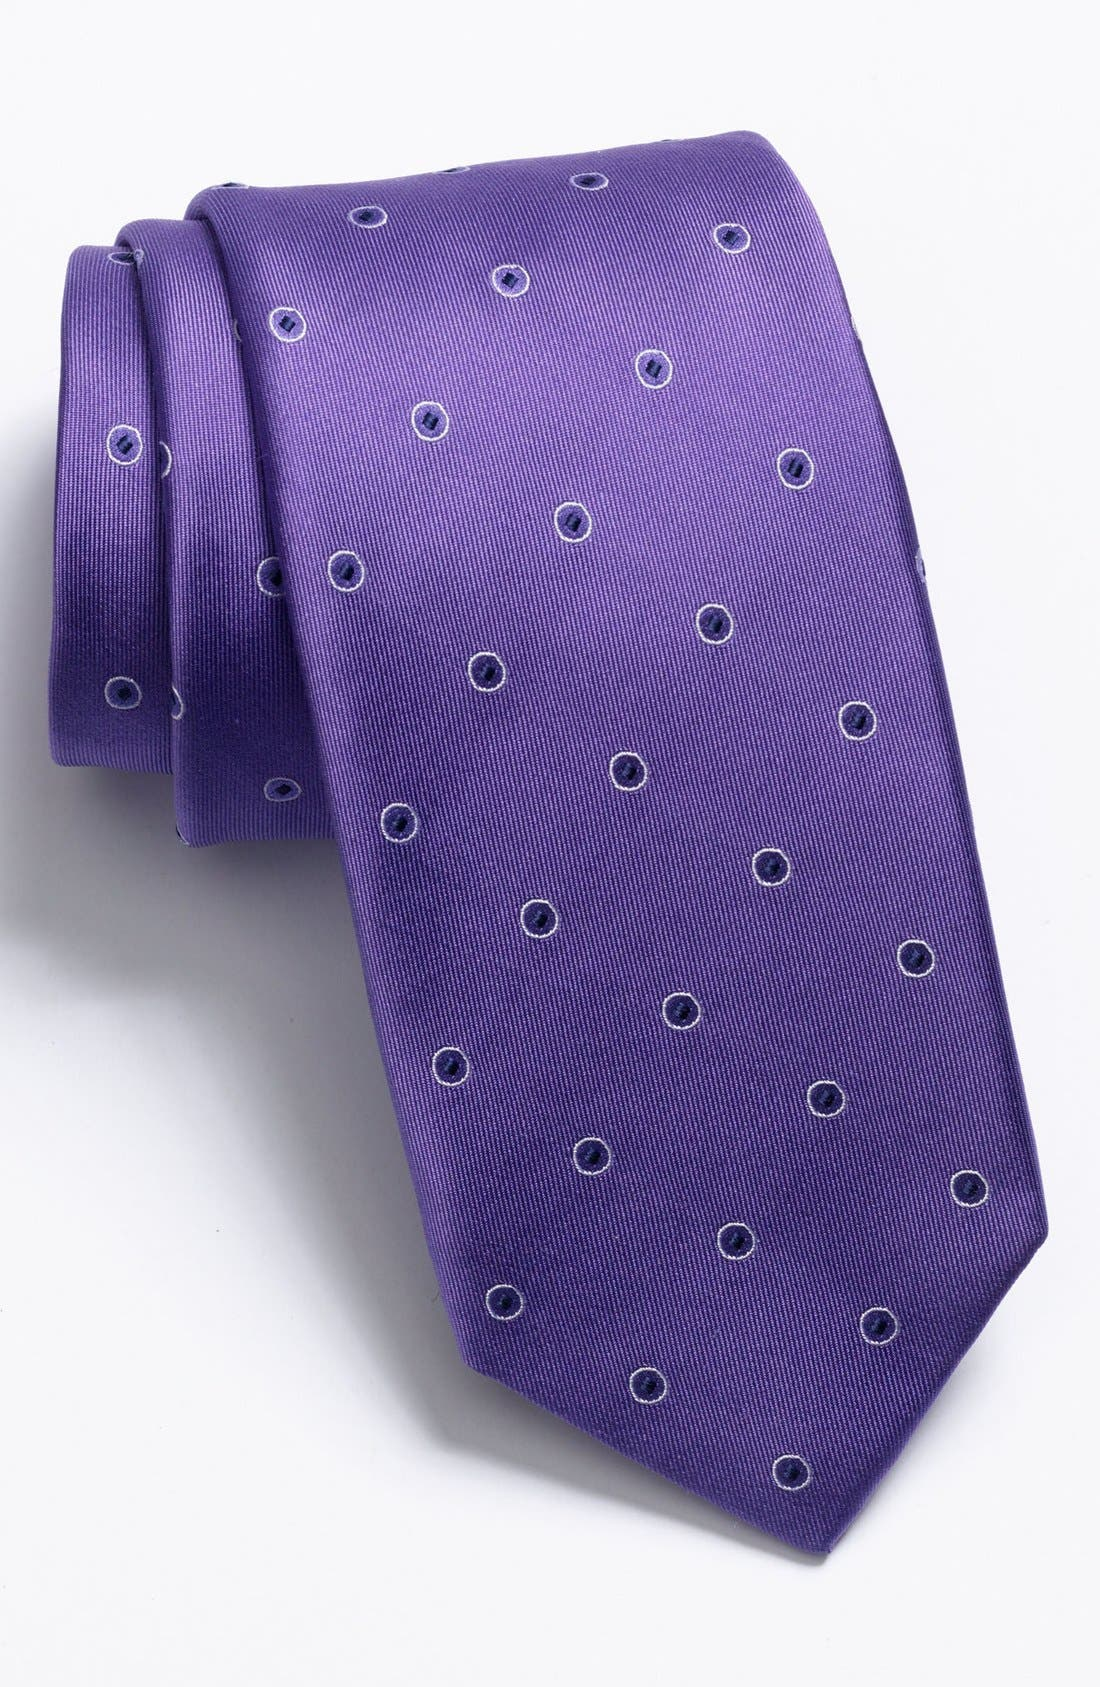 Alternate Image 1 Selected - Calibrate Dress Shirt & Tie